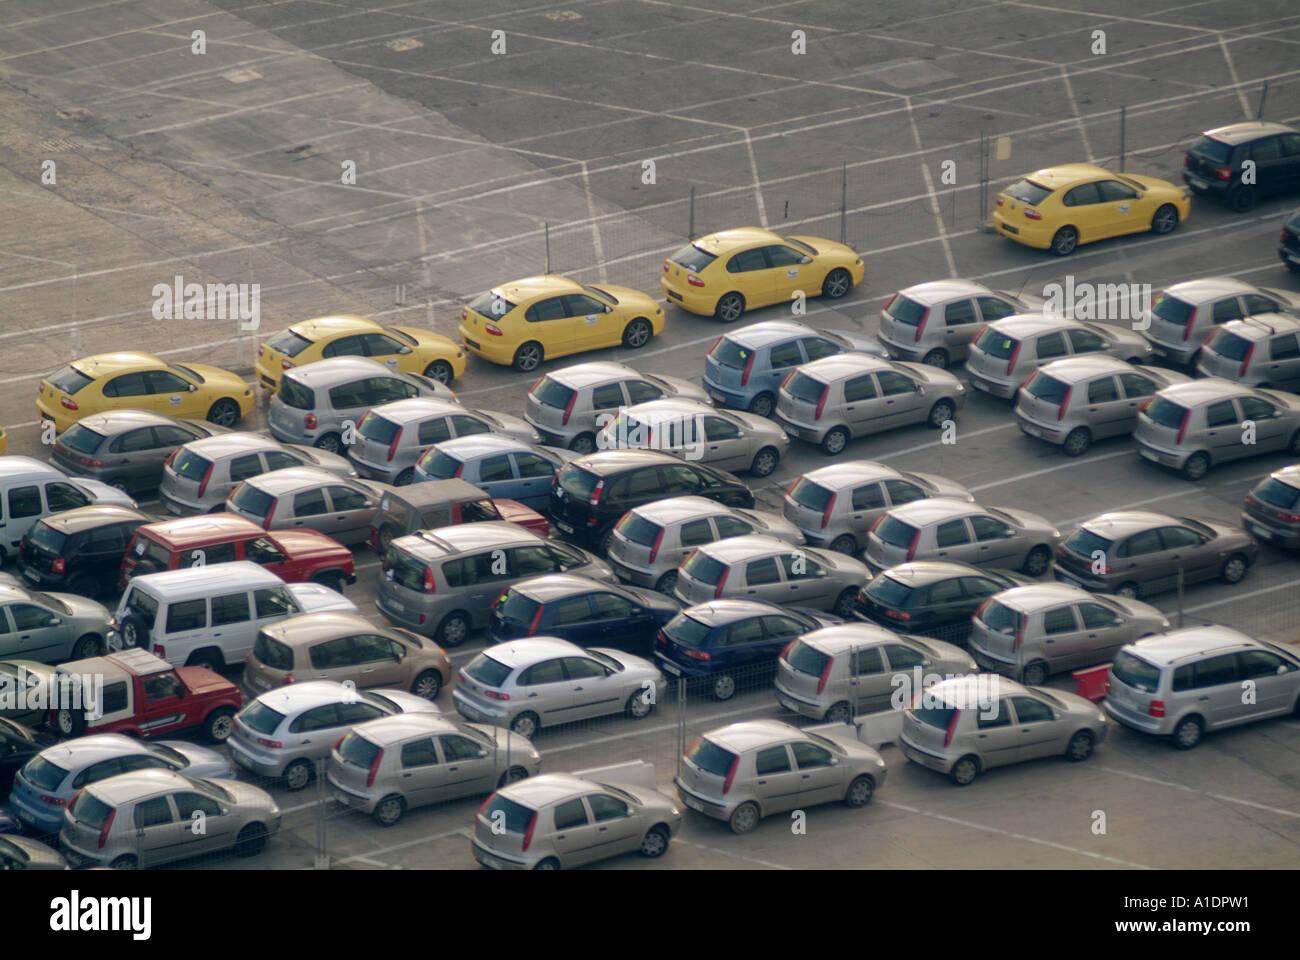 New Cars At Port Awaiting Shipping Export Import Docks